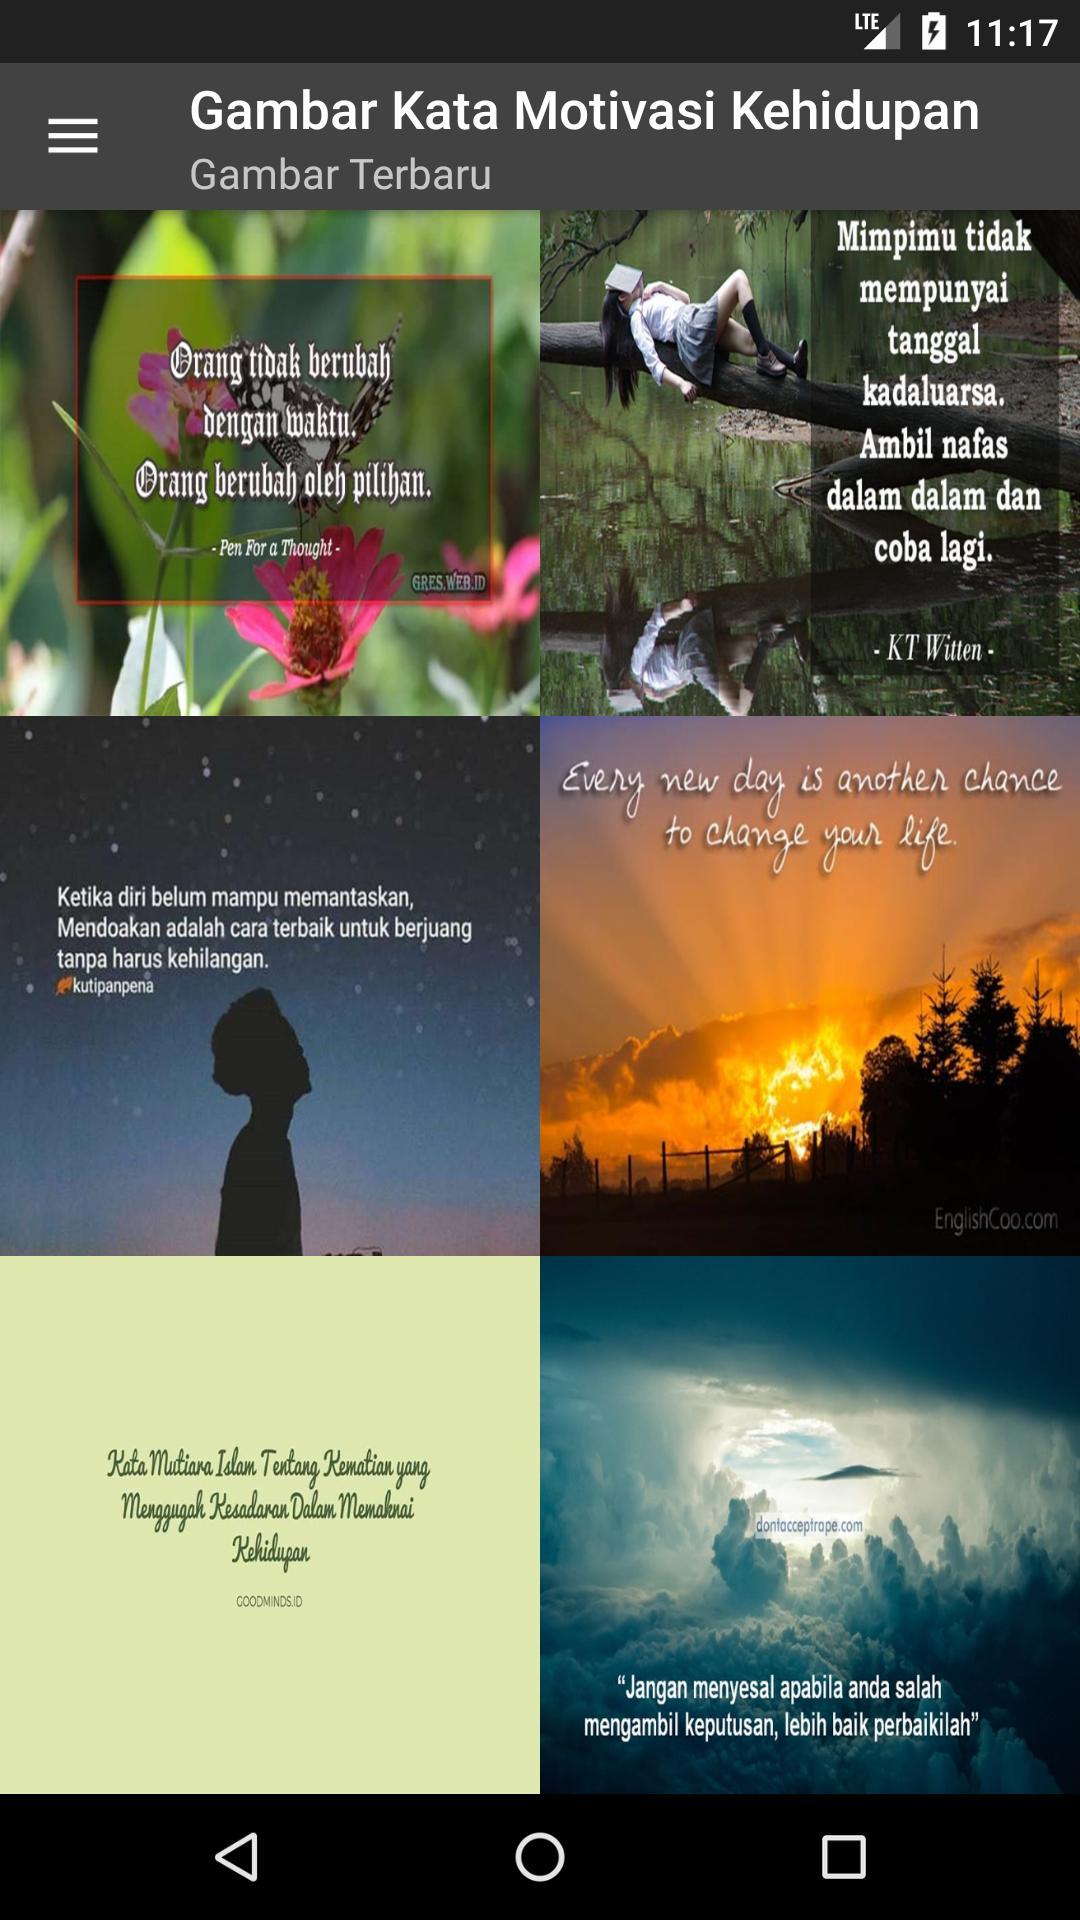 4600 Gambar Kata Motivasi Hidup Islam Terbaru Gambar Romantis